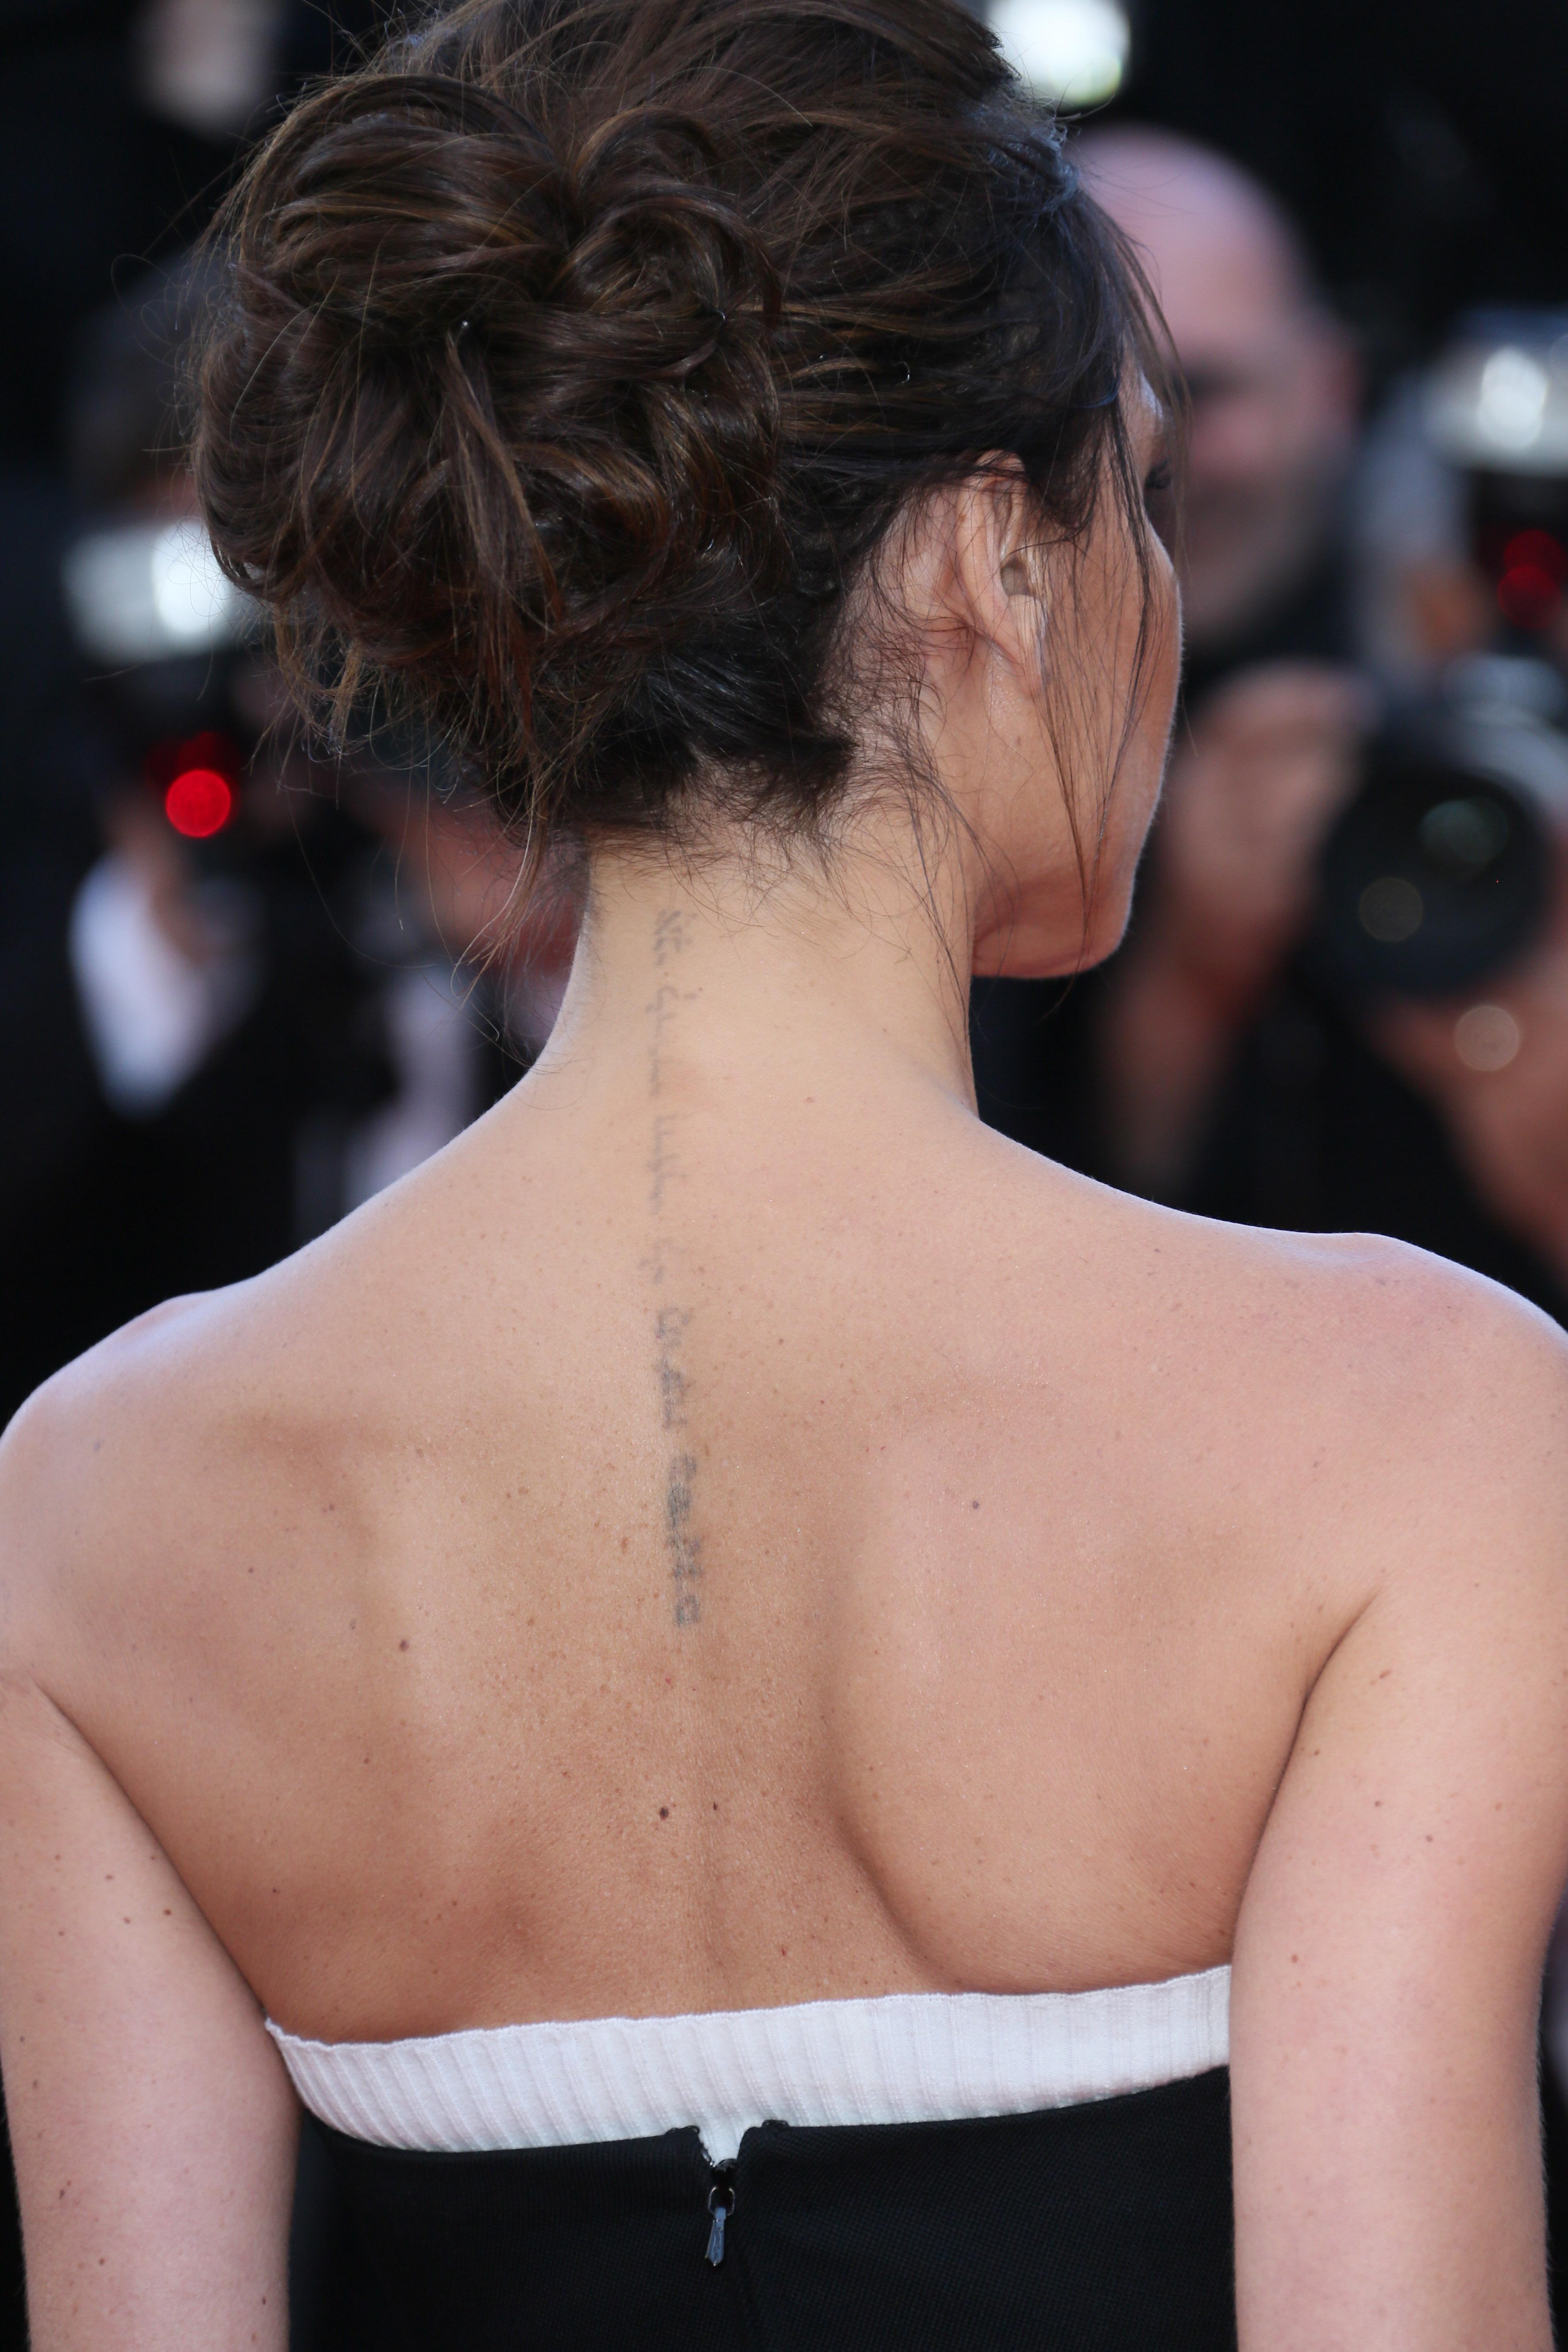 Victoria Beckham Tattoo 2016